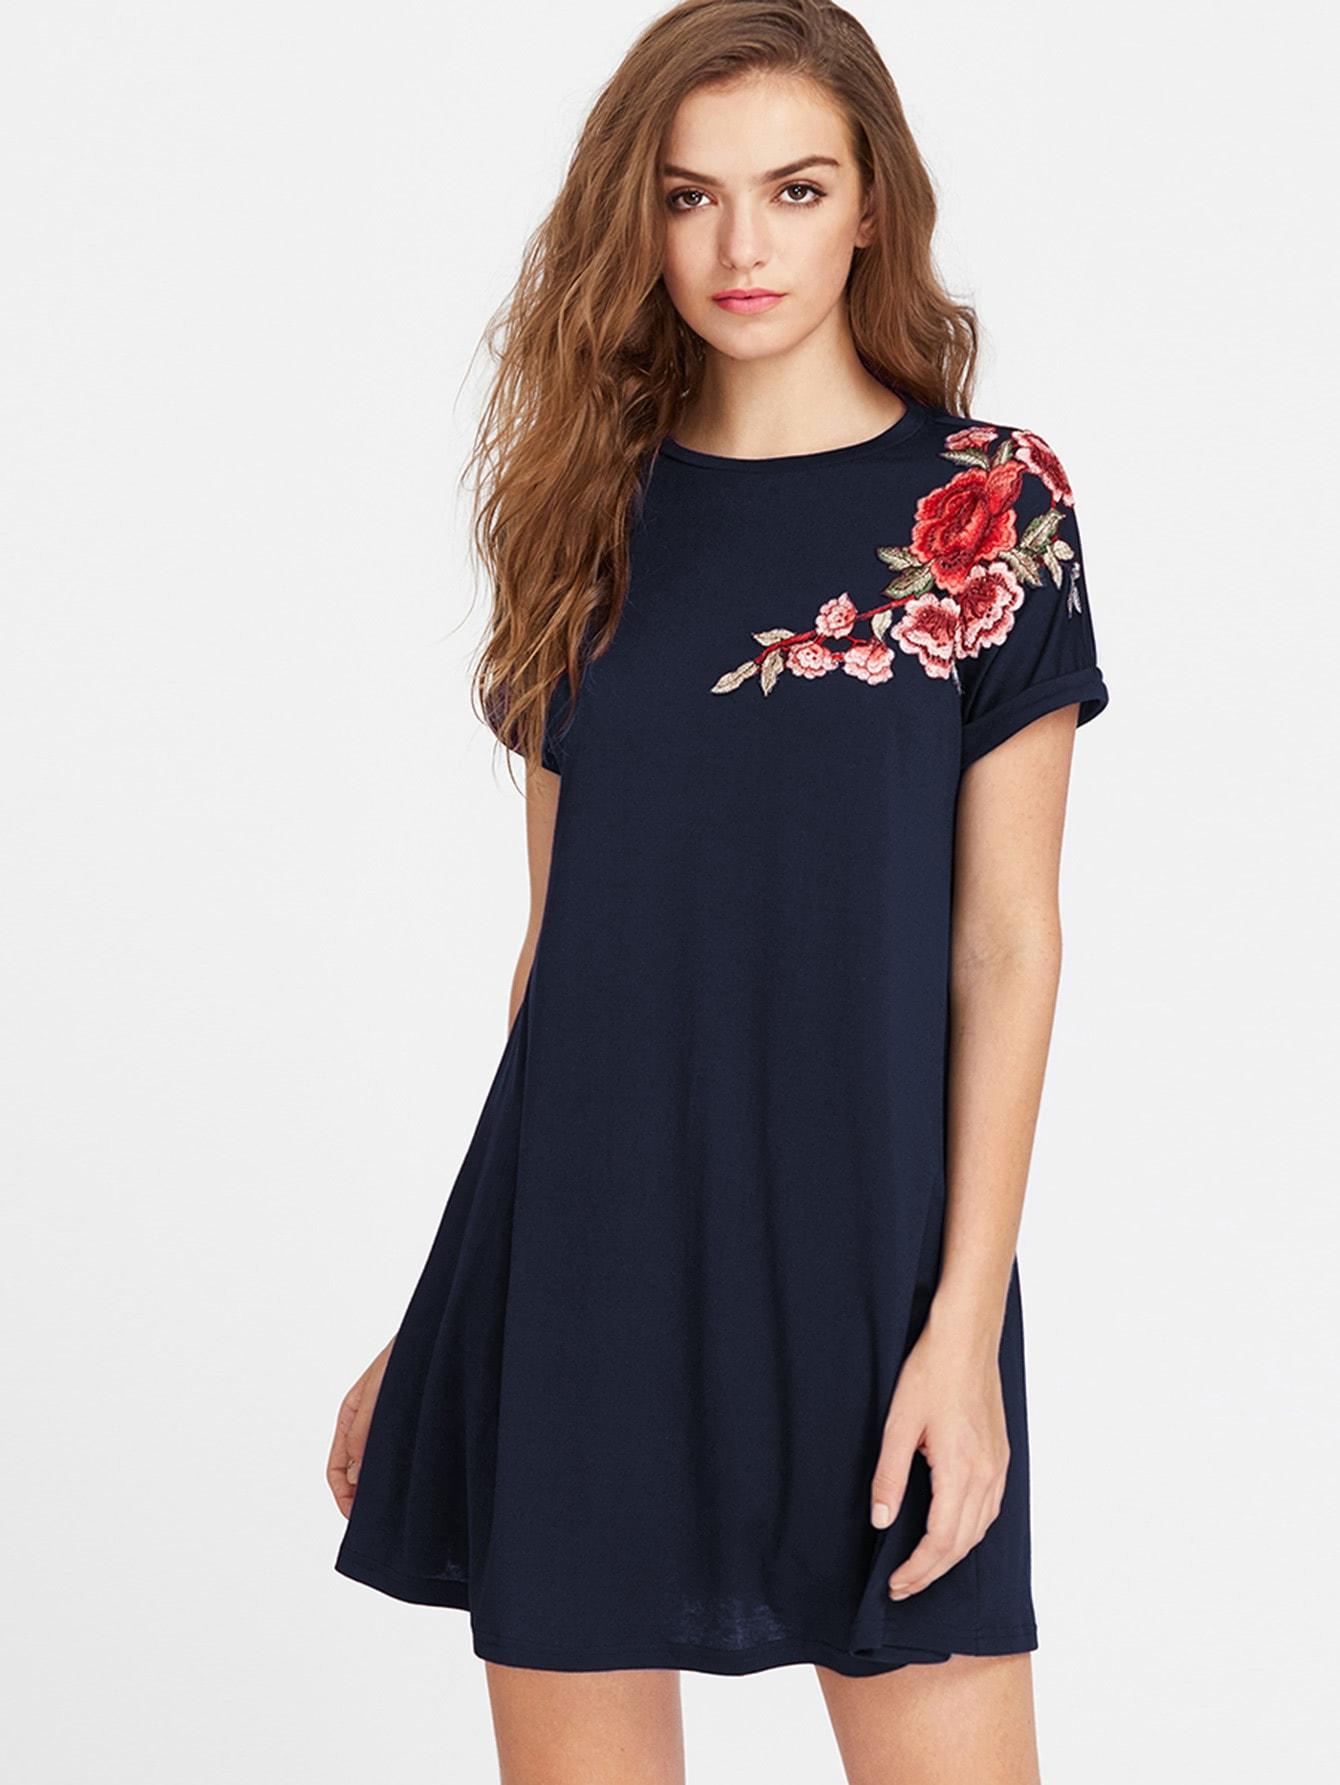 Embroidered Flower Applique Swing Tee Dress flower applique crop tee